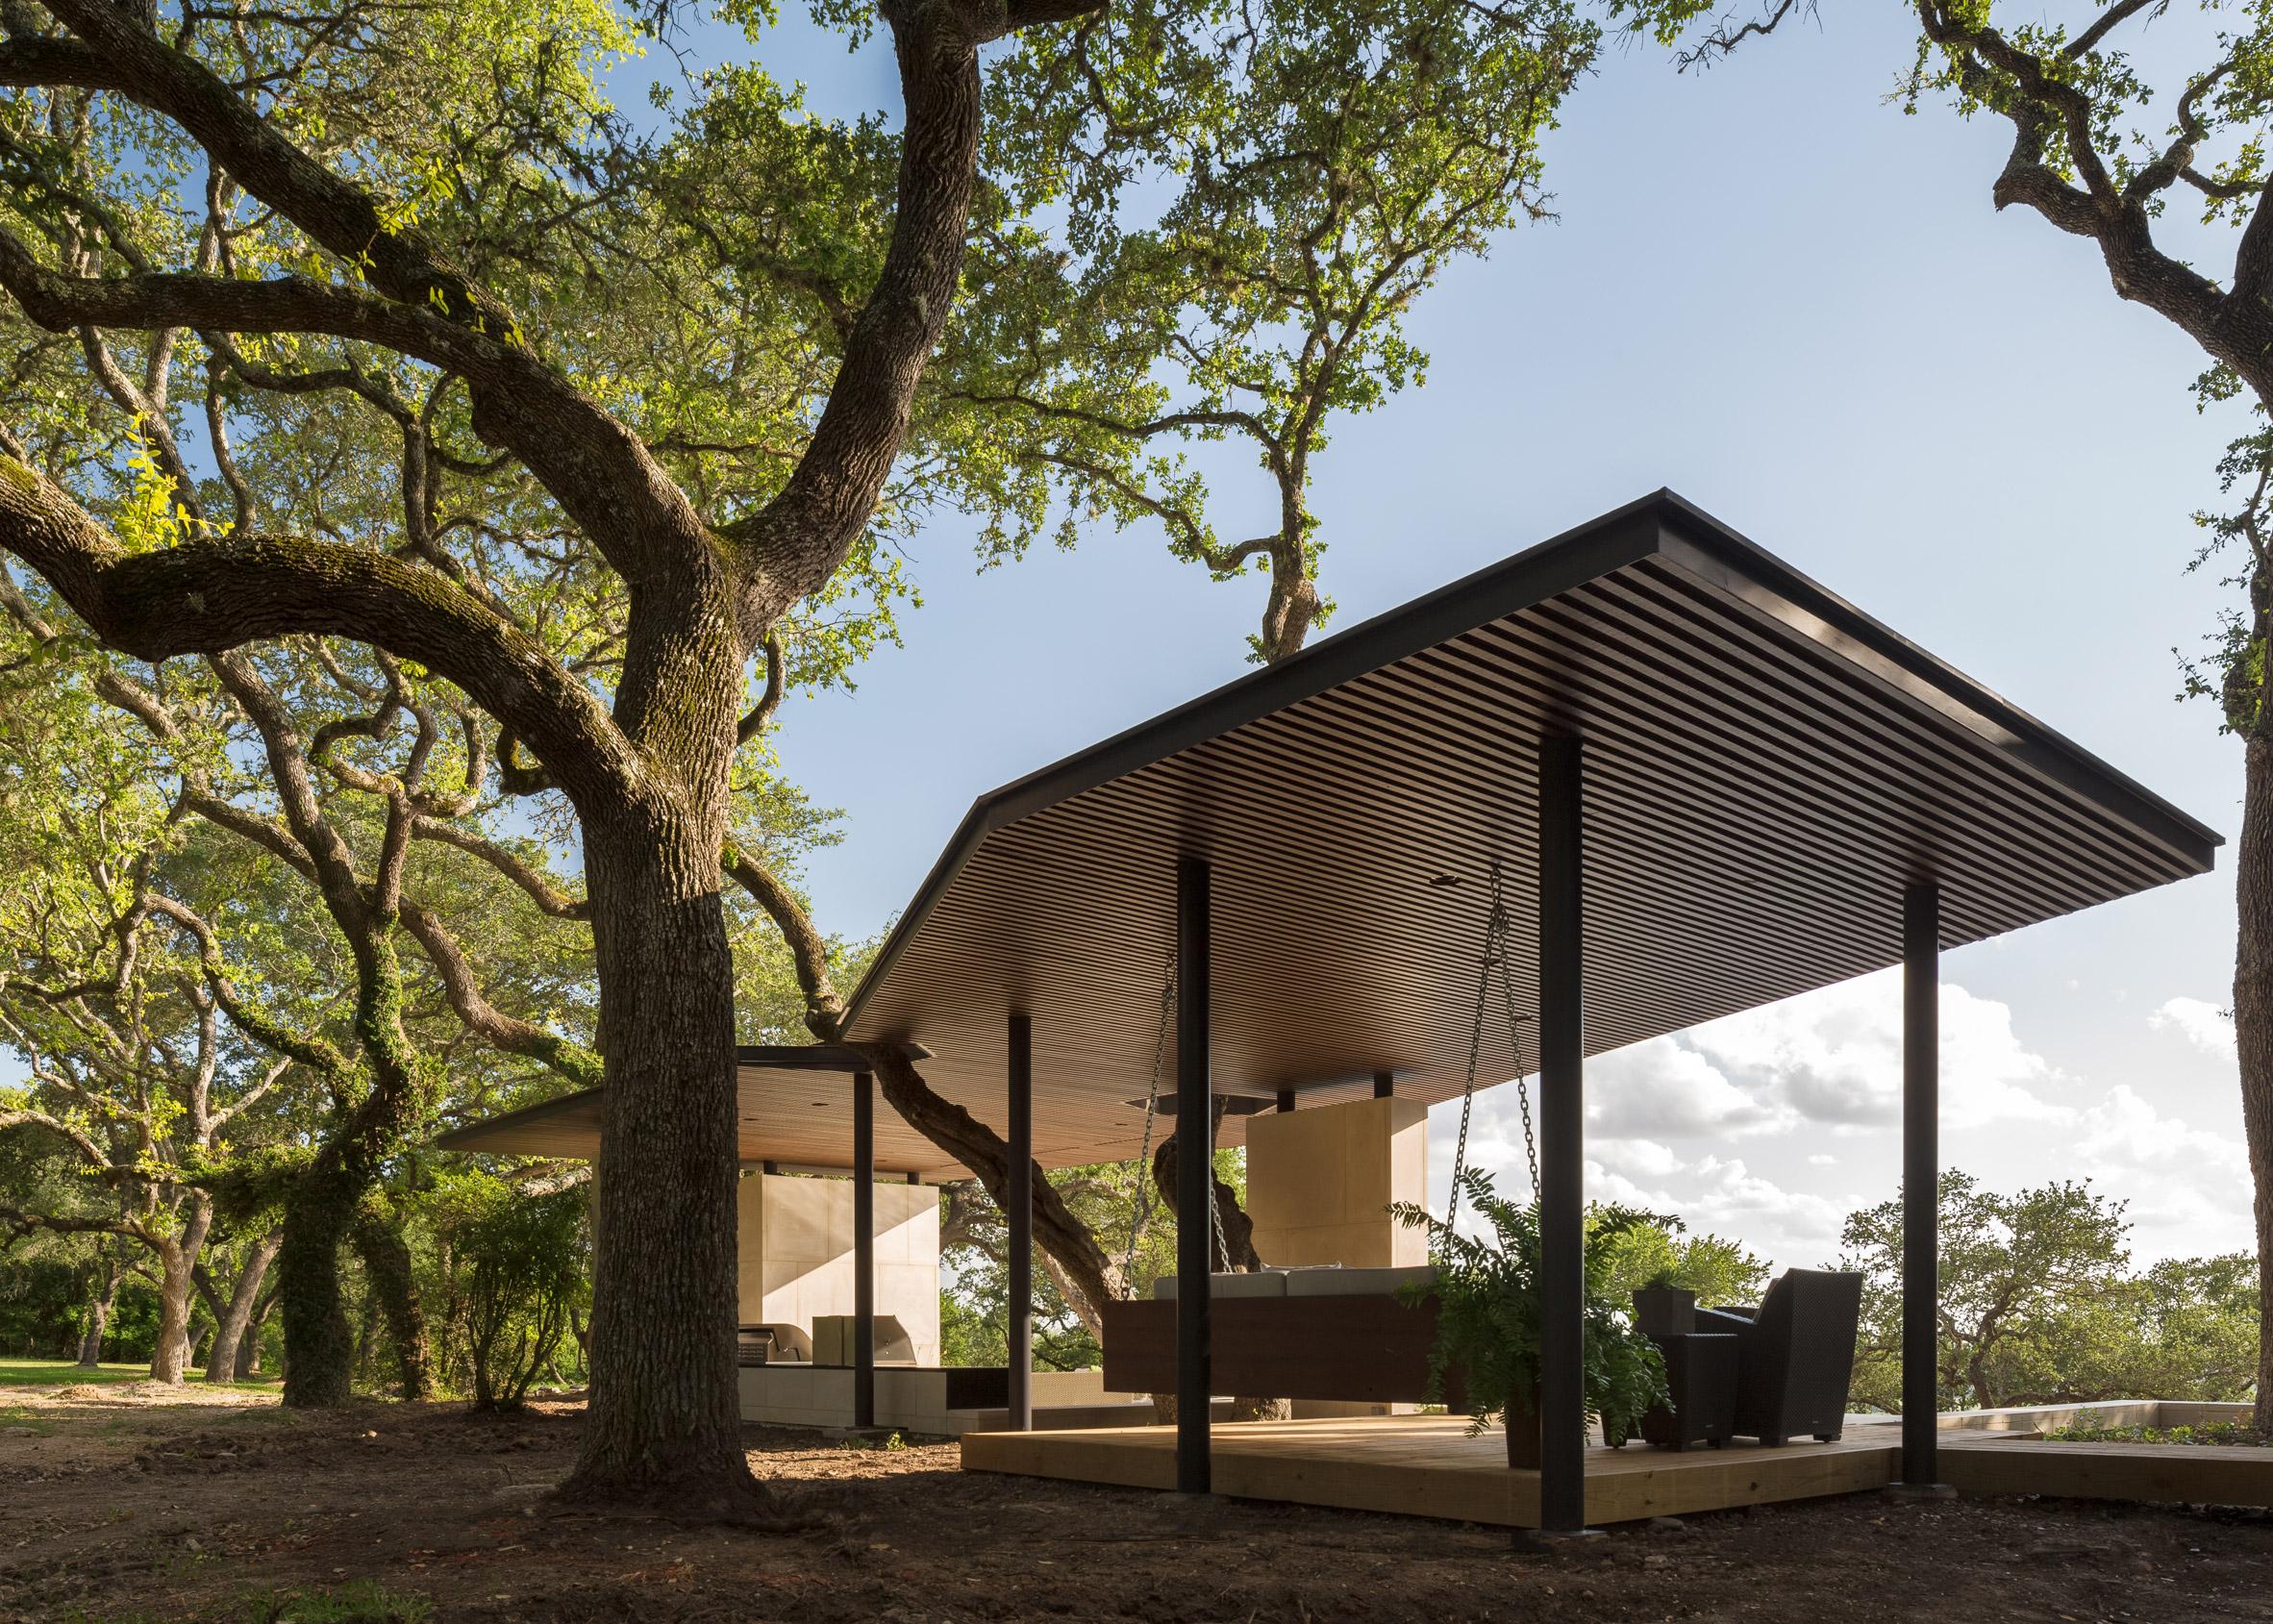 La Grange Pavilion by Murray Legge Architecture